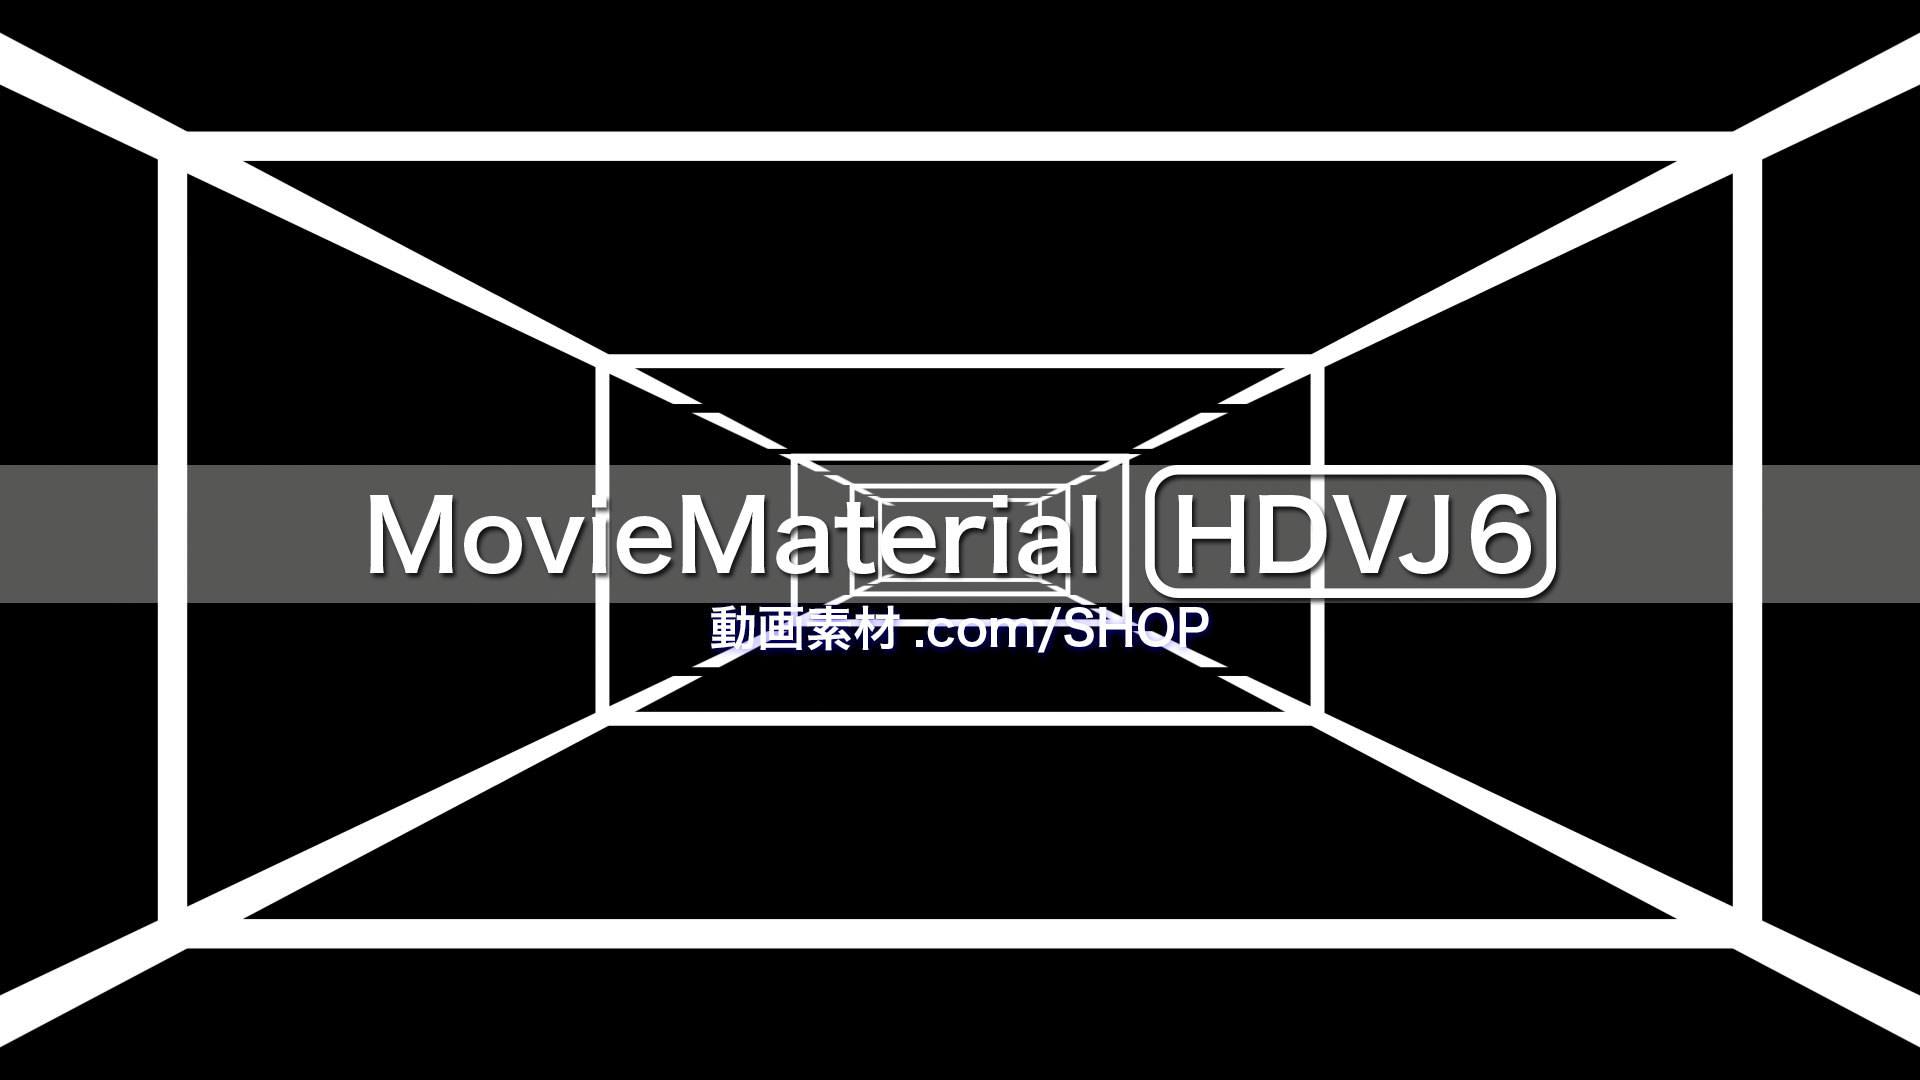 MovieMaterial HDVJ6 フルハイビジョンVJ動画素材集 画像2